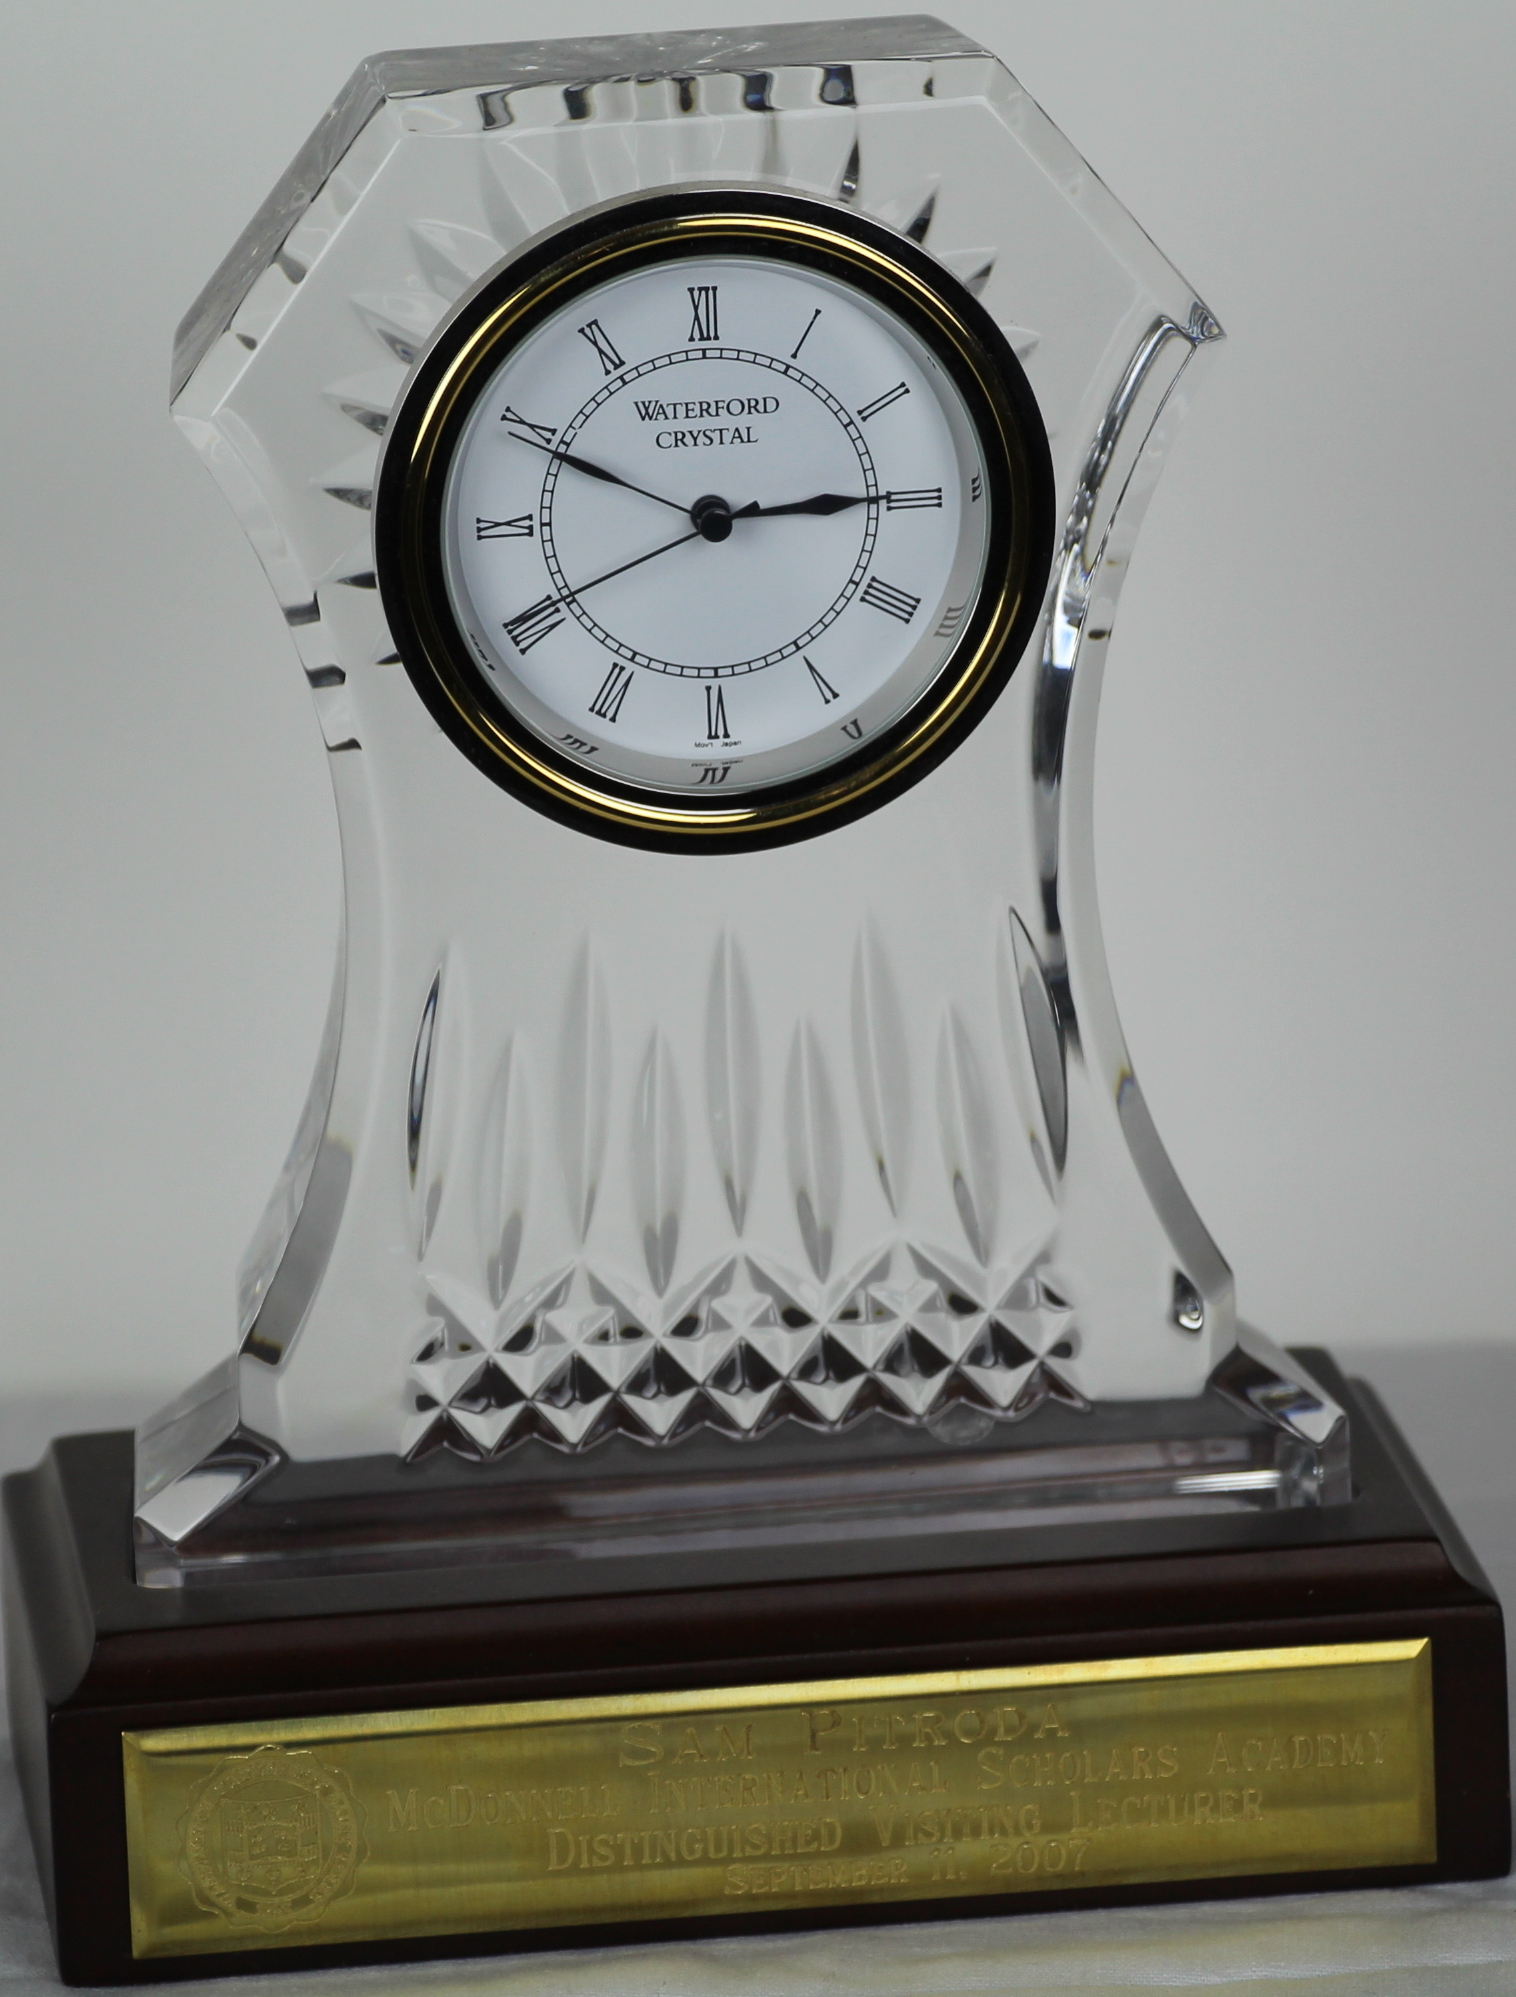 Distinguished Visiting Lecturer Award, McDonnell International Scholars Academy, 2007